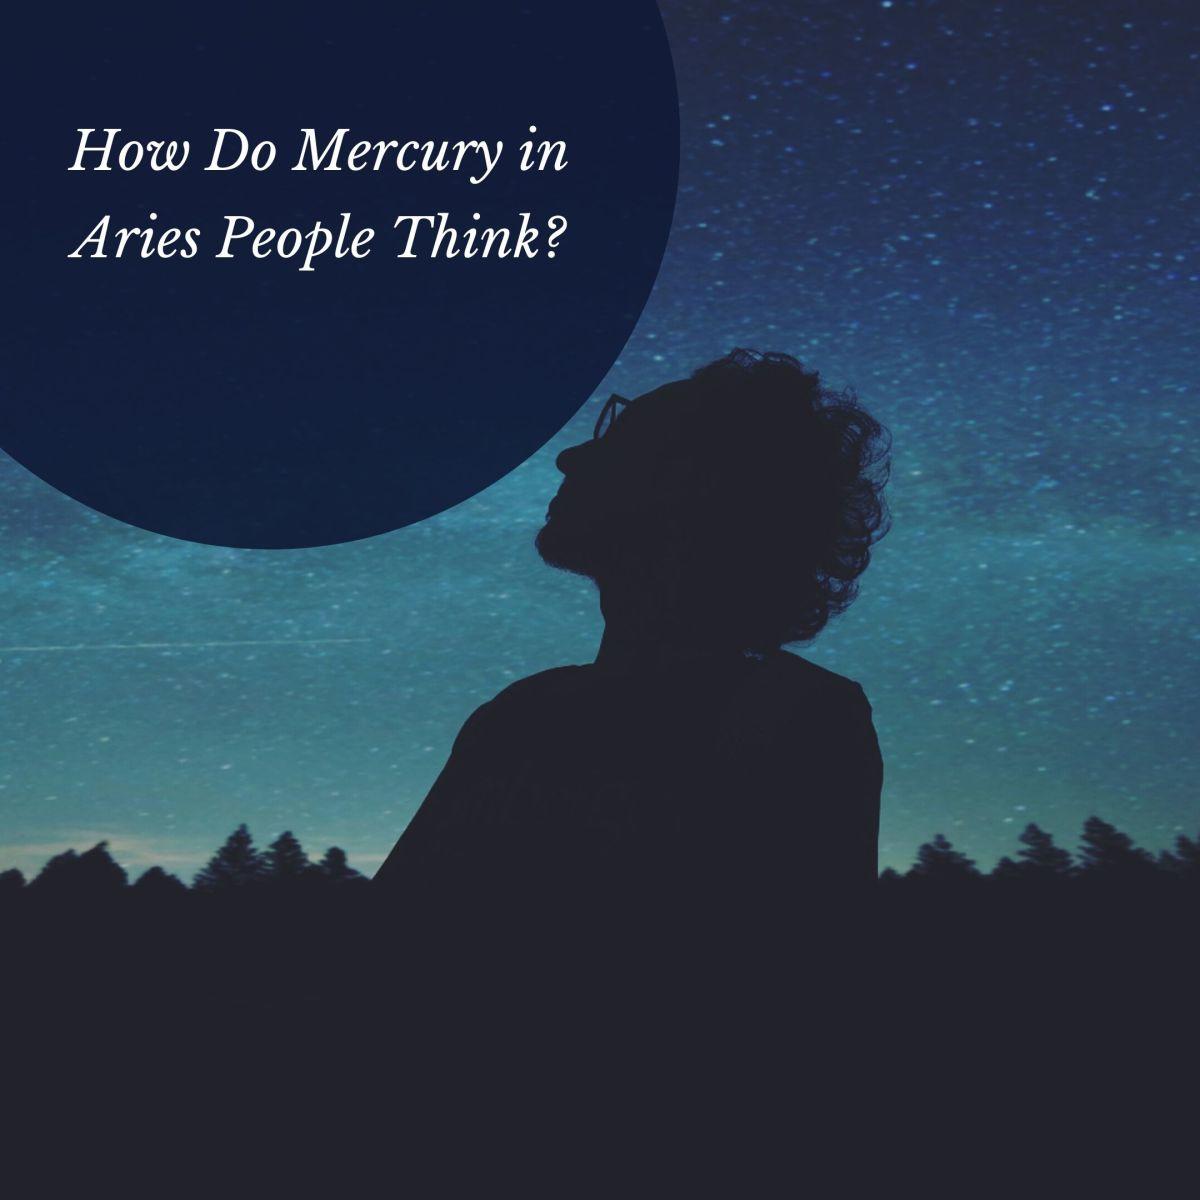 Mercury rules how we think.